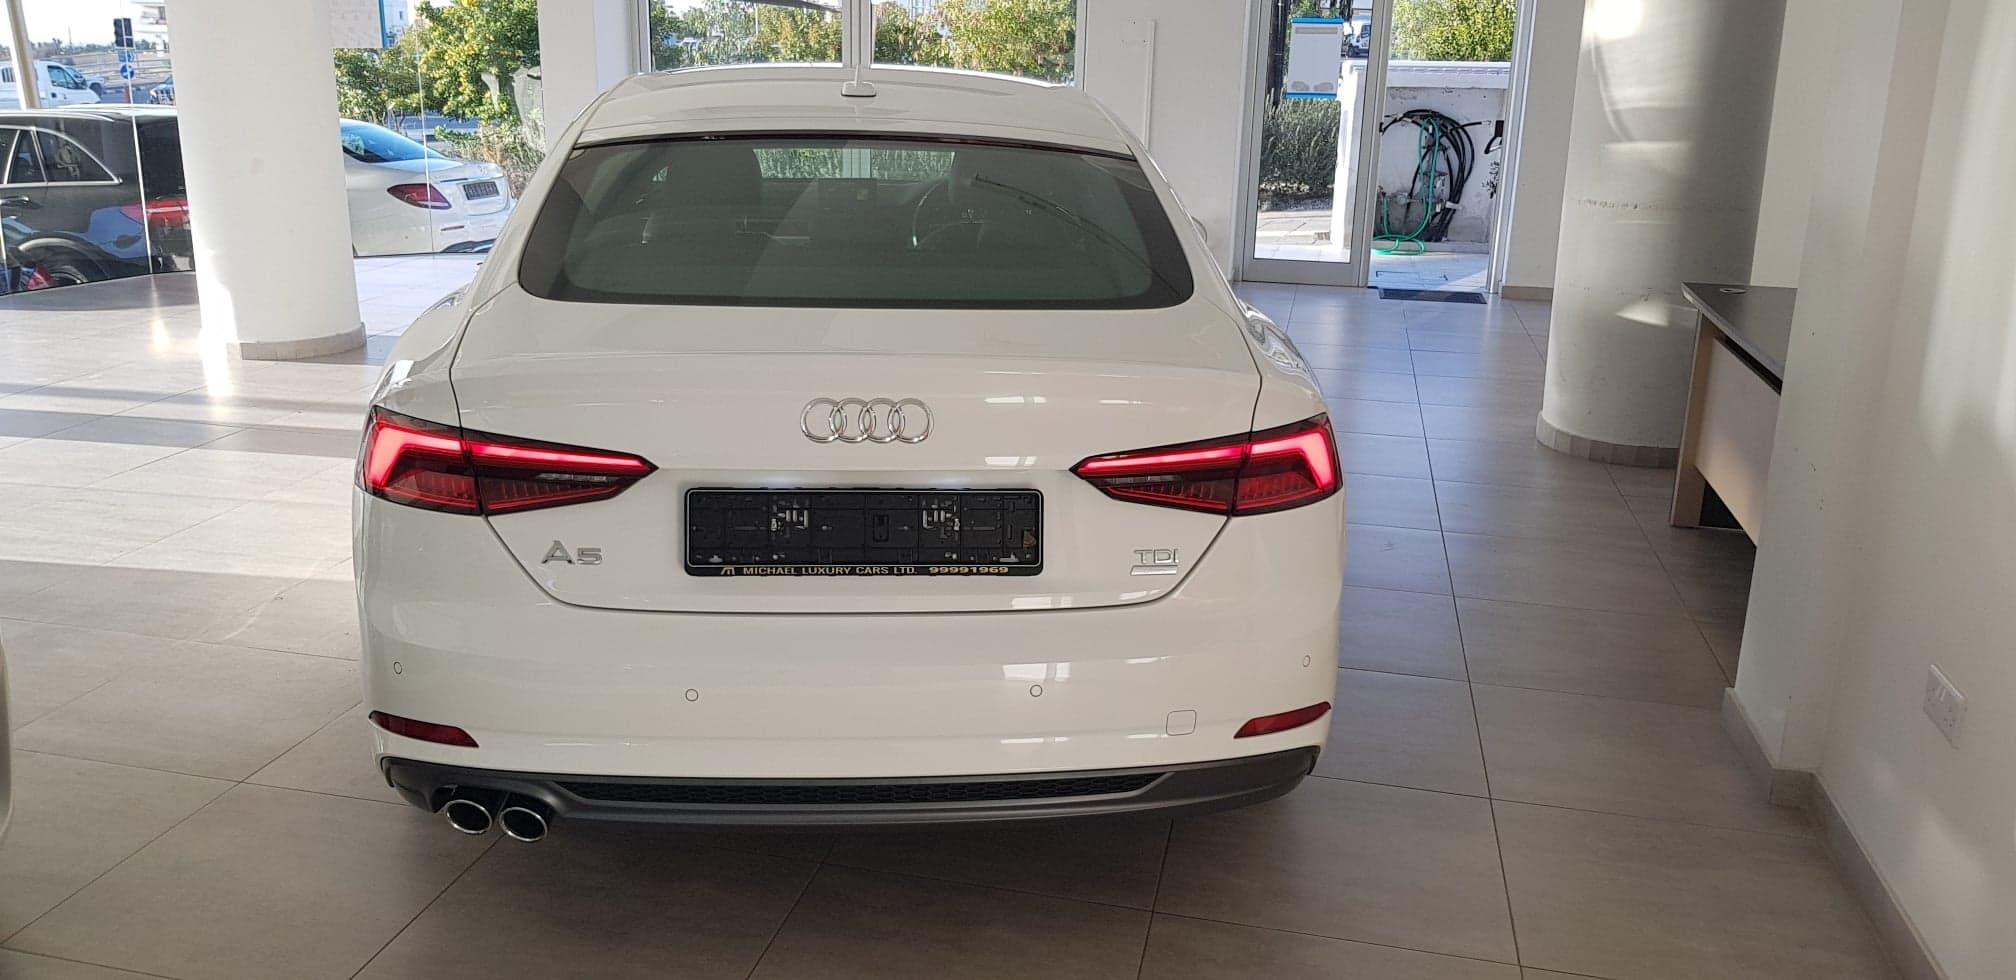 Audi A5 Sportsback 2.0 TDI S LINE Hatchback